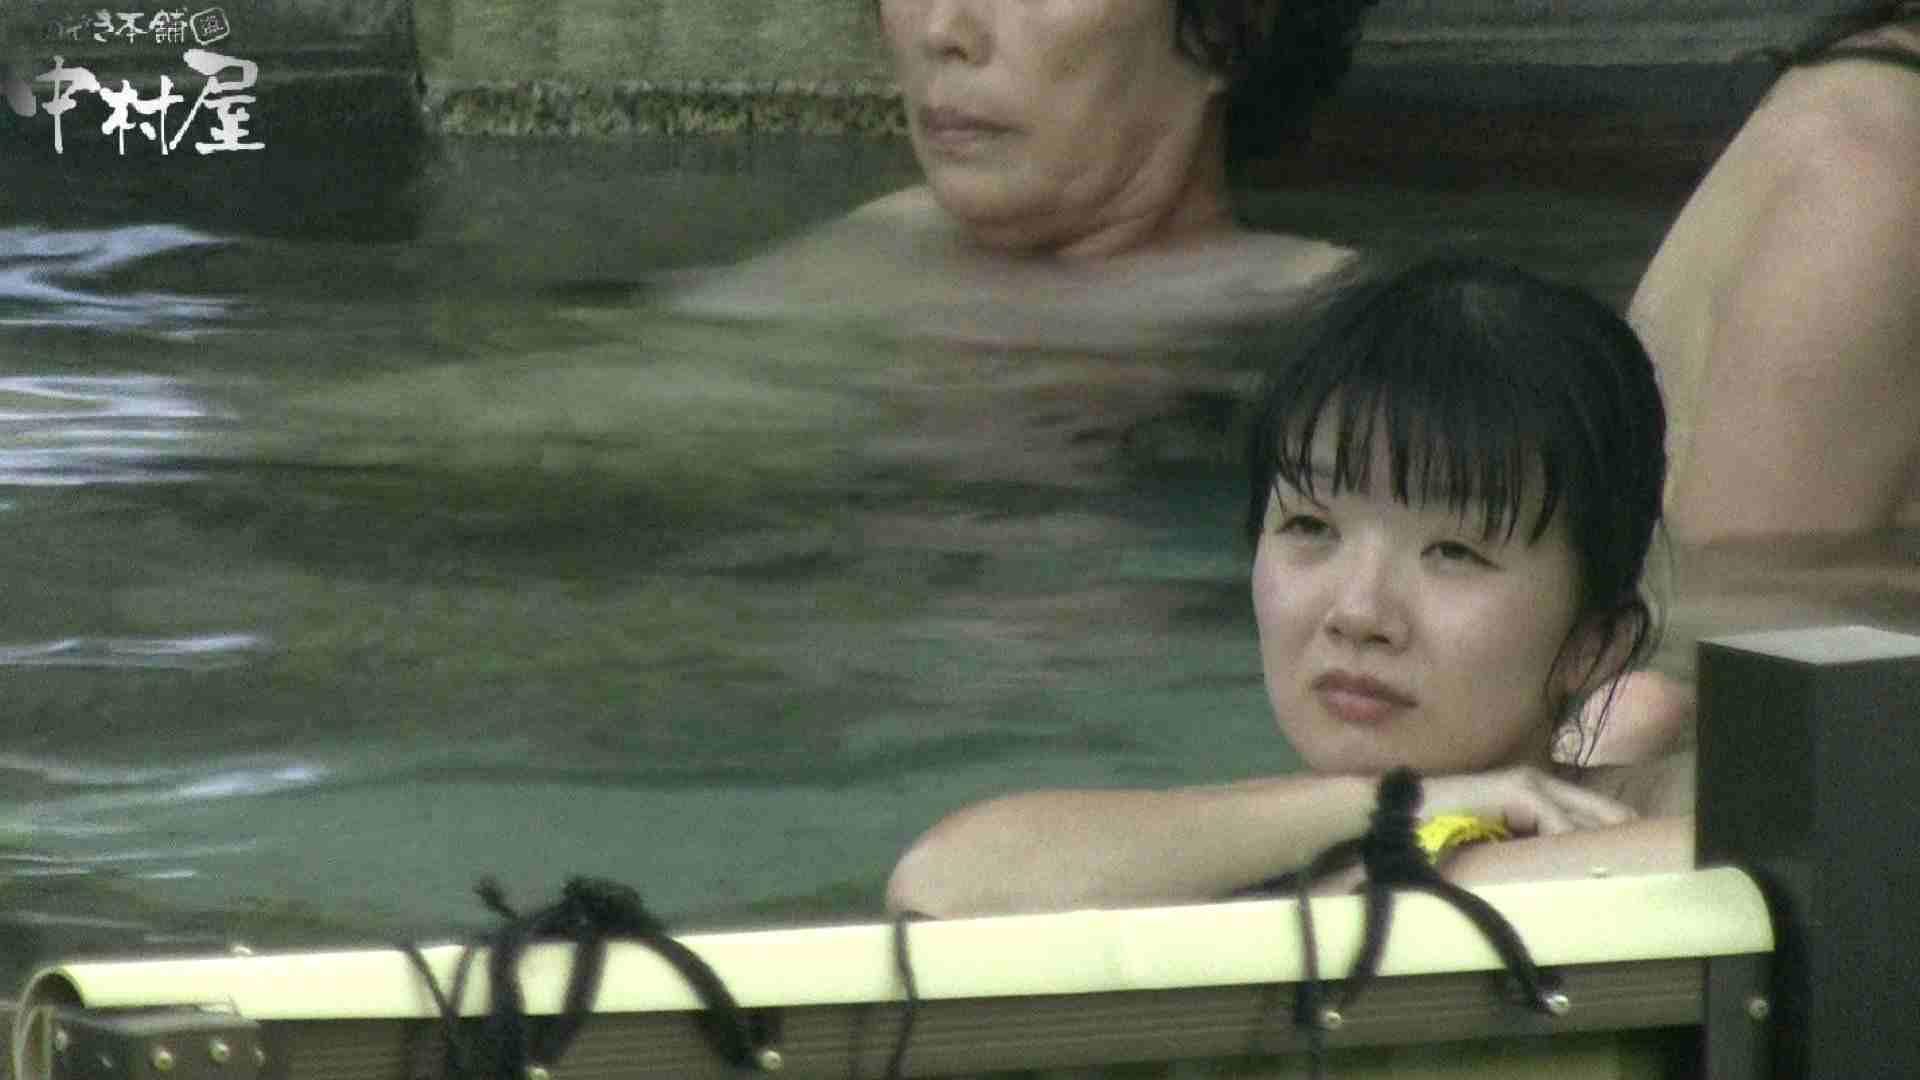 Aquaな露天風呂Vol.904 盗撮師作品 | 露天風呂突入  103pic 31